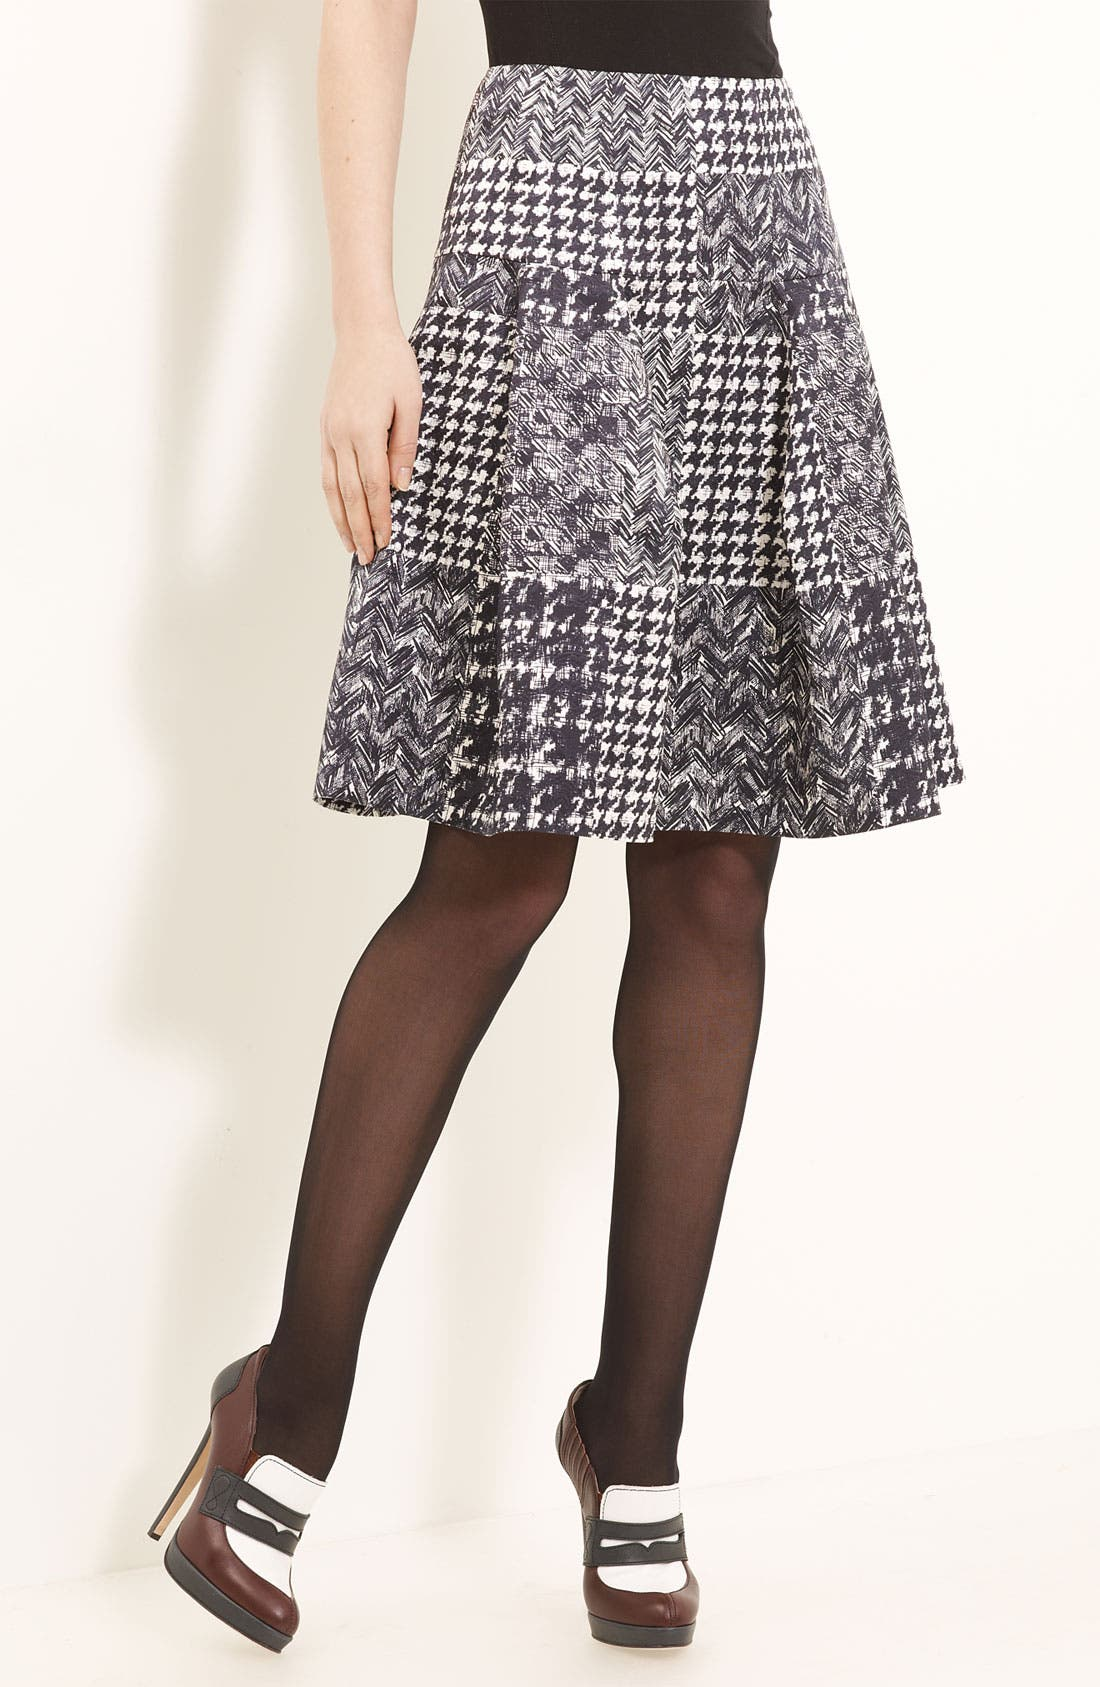 Main Image - Oscar de la Renta Tweed & Matelassé Patchwork Skirt